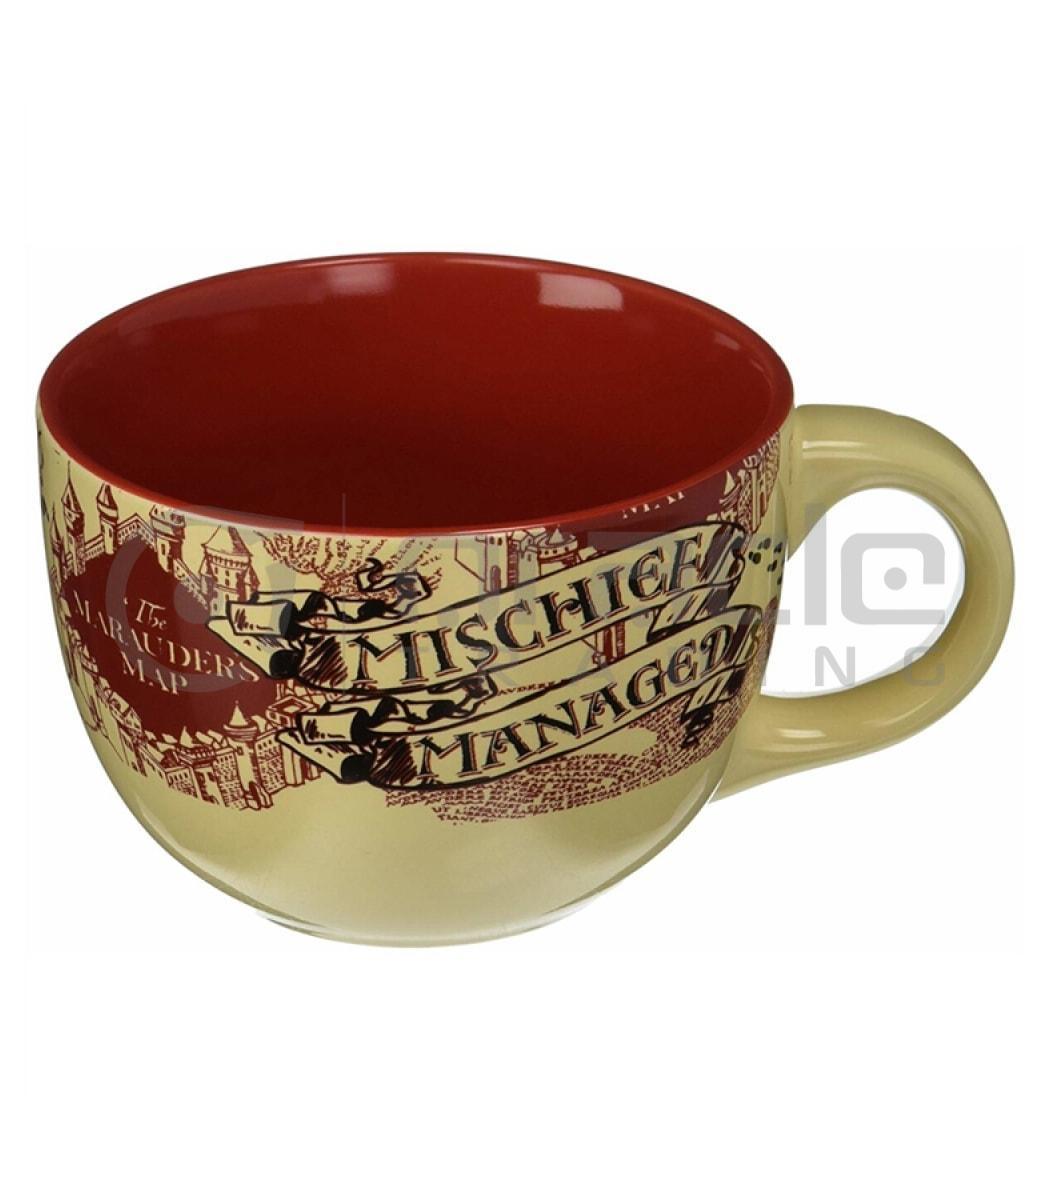 Harry Potter Soup Mug - Marauders Map